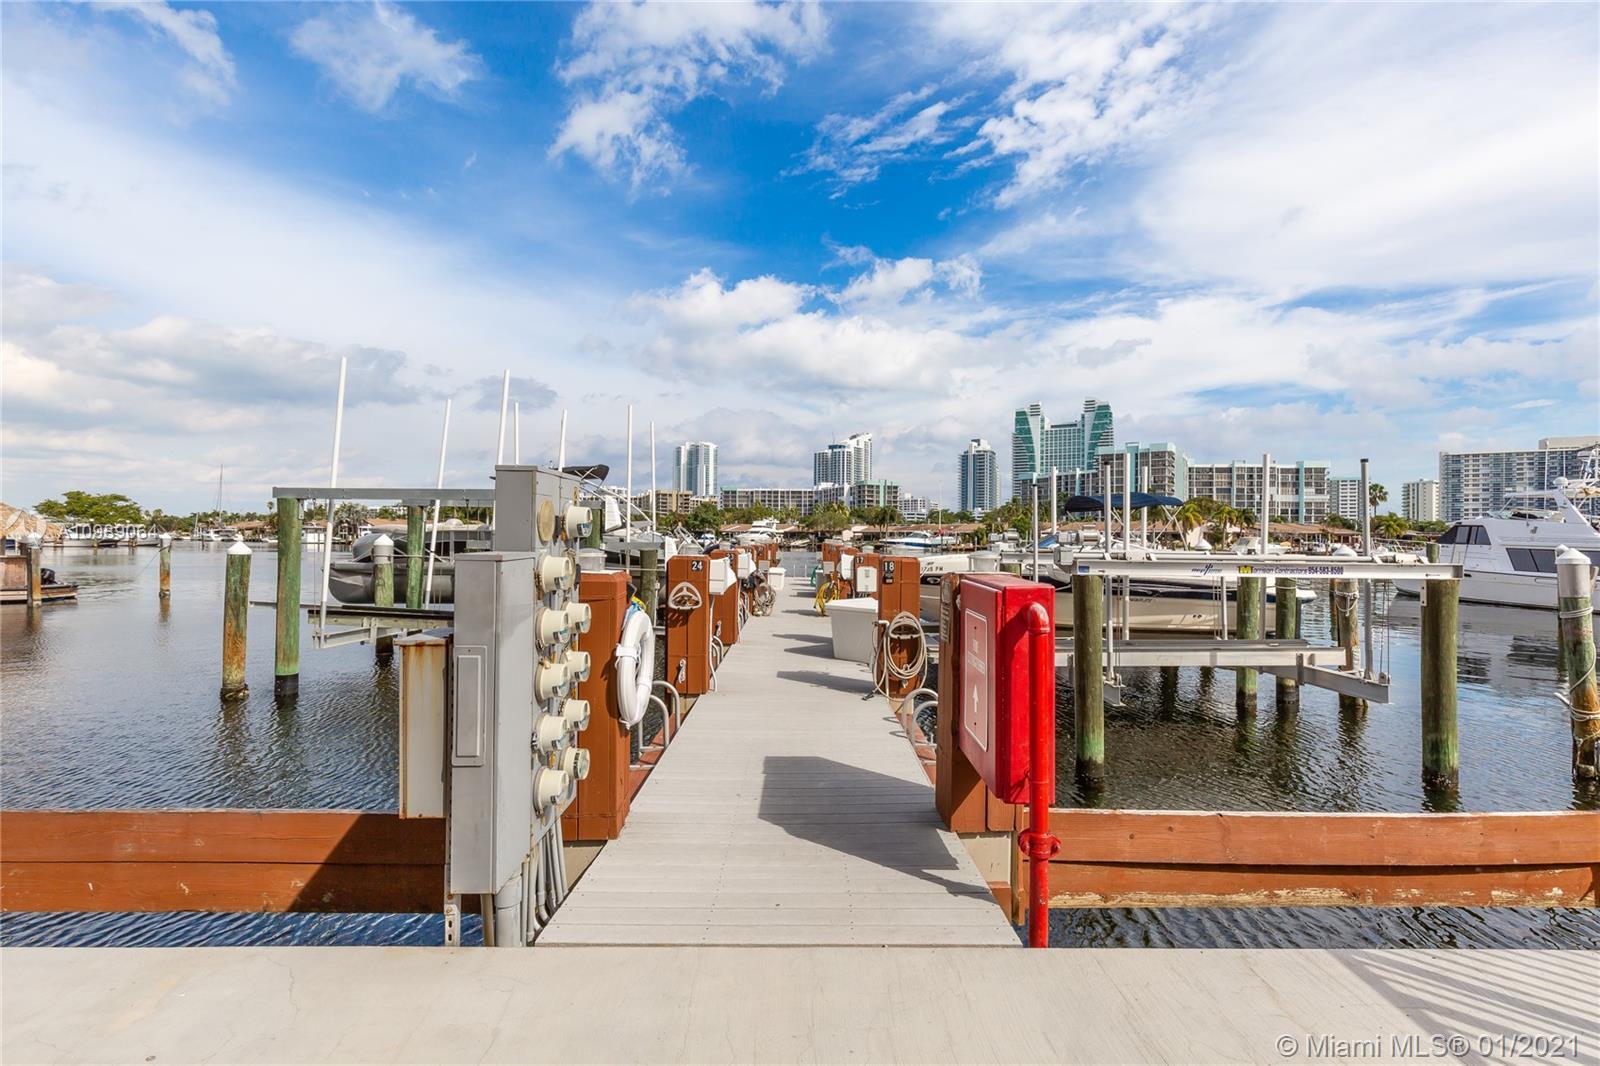 Photo of 300 Three Islands Blvd #305 with dock, Hallandale Beach, Florida, 33009 -